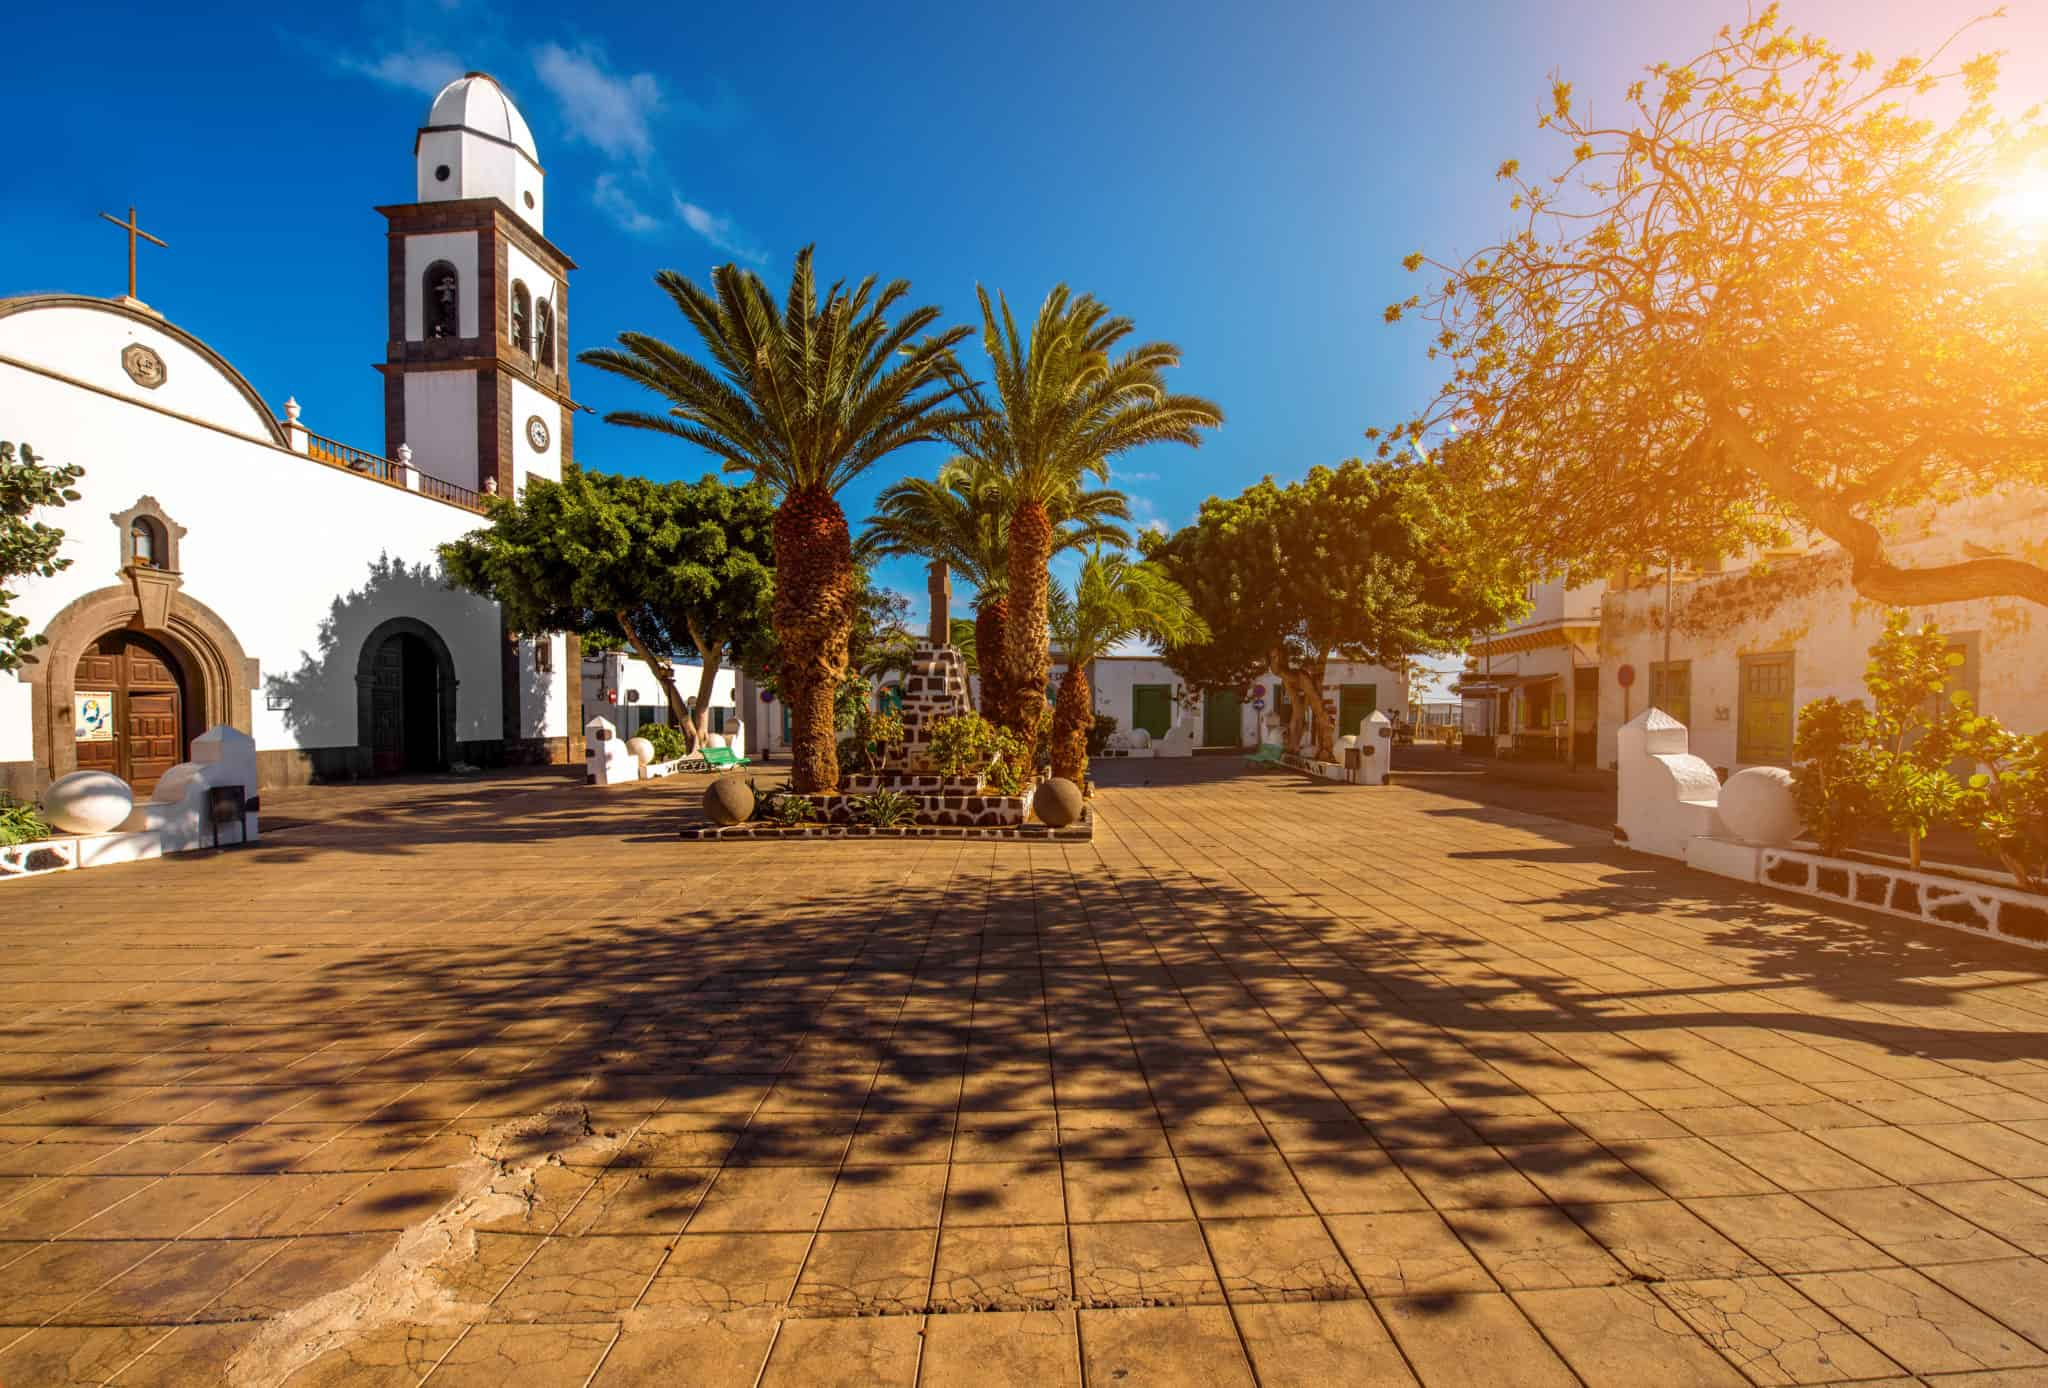 San Gines church in Arrecife city on Lanzarote island